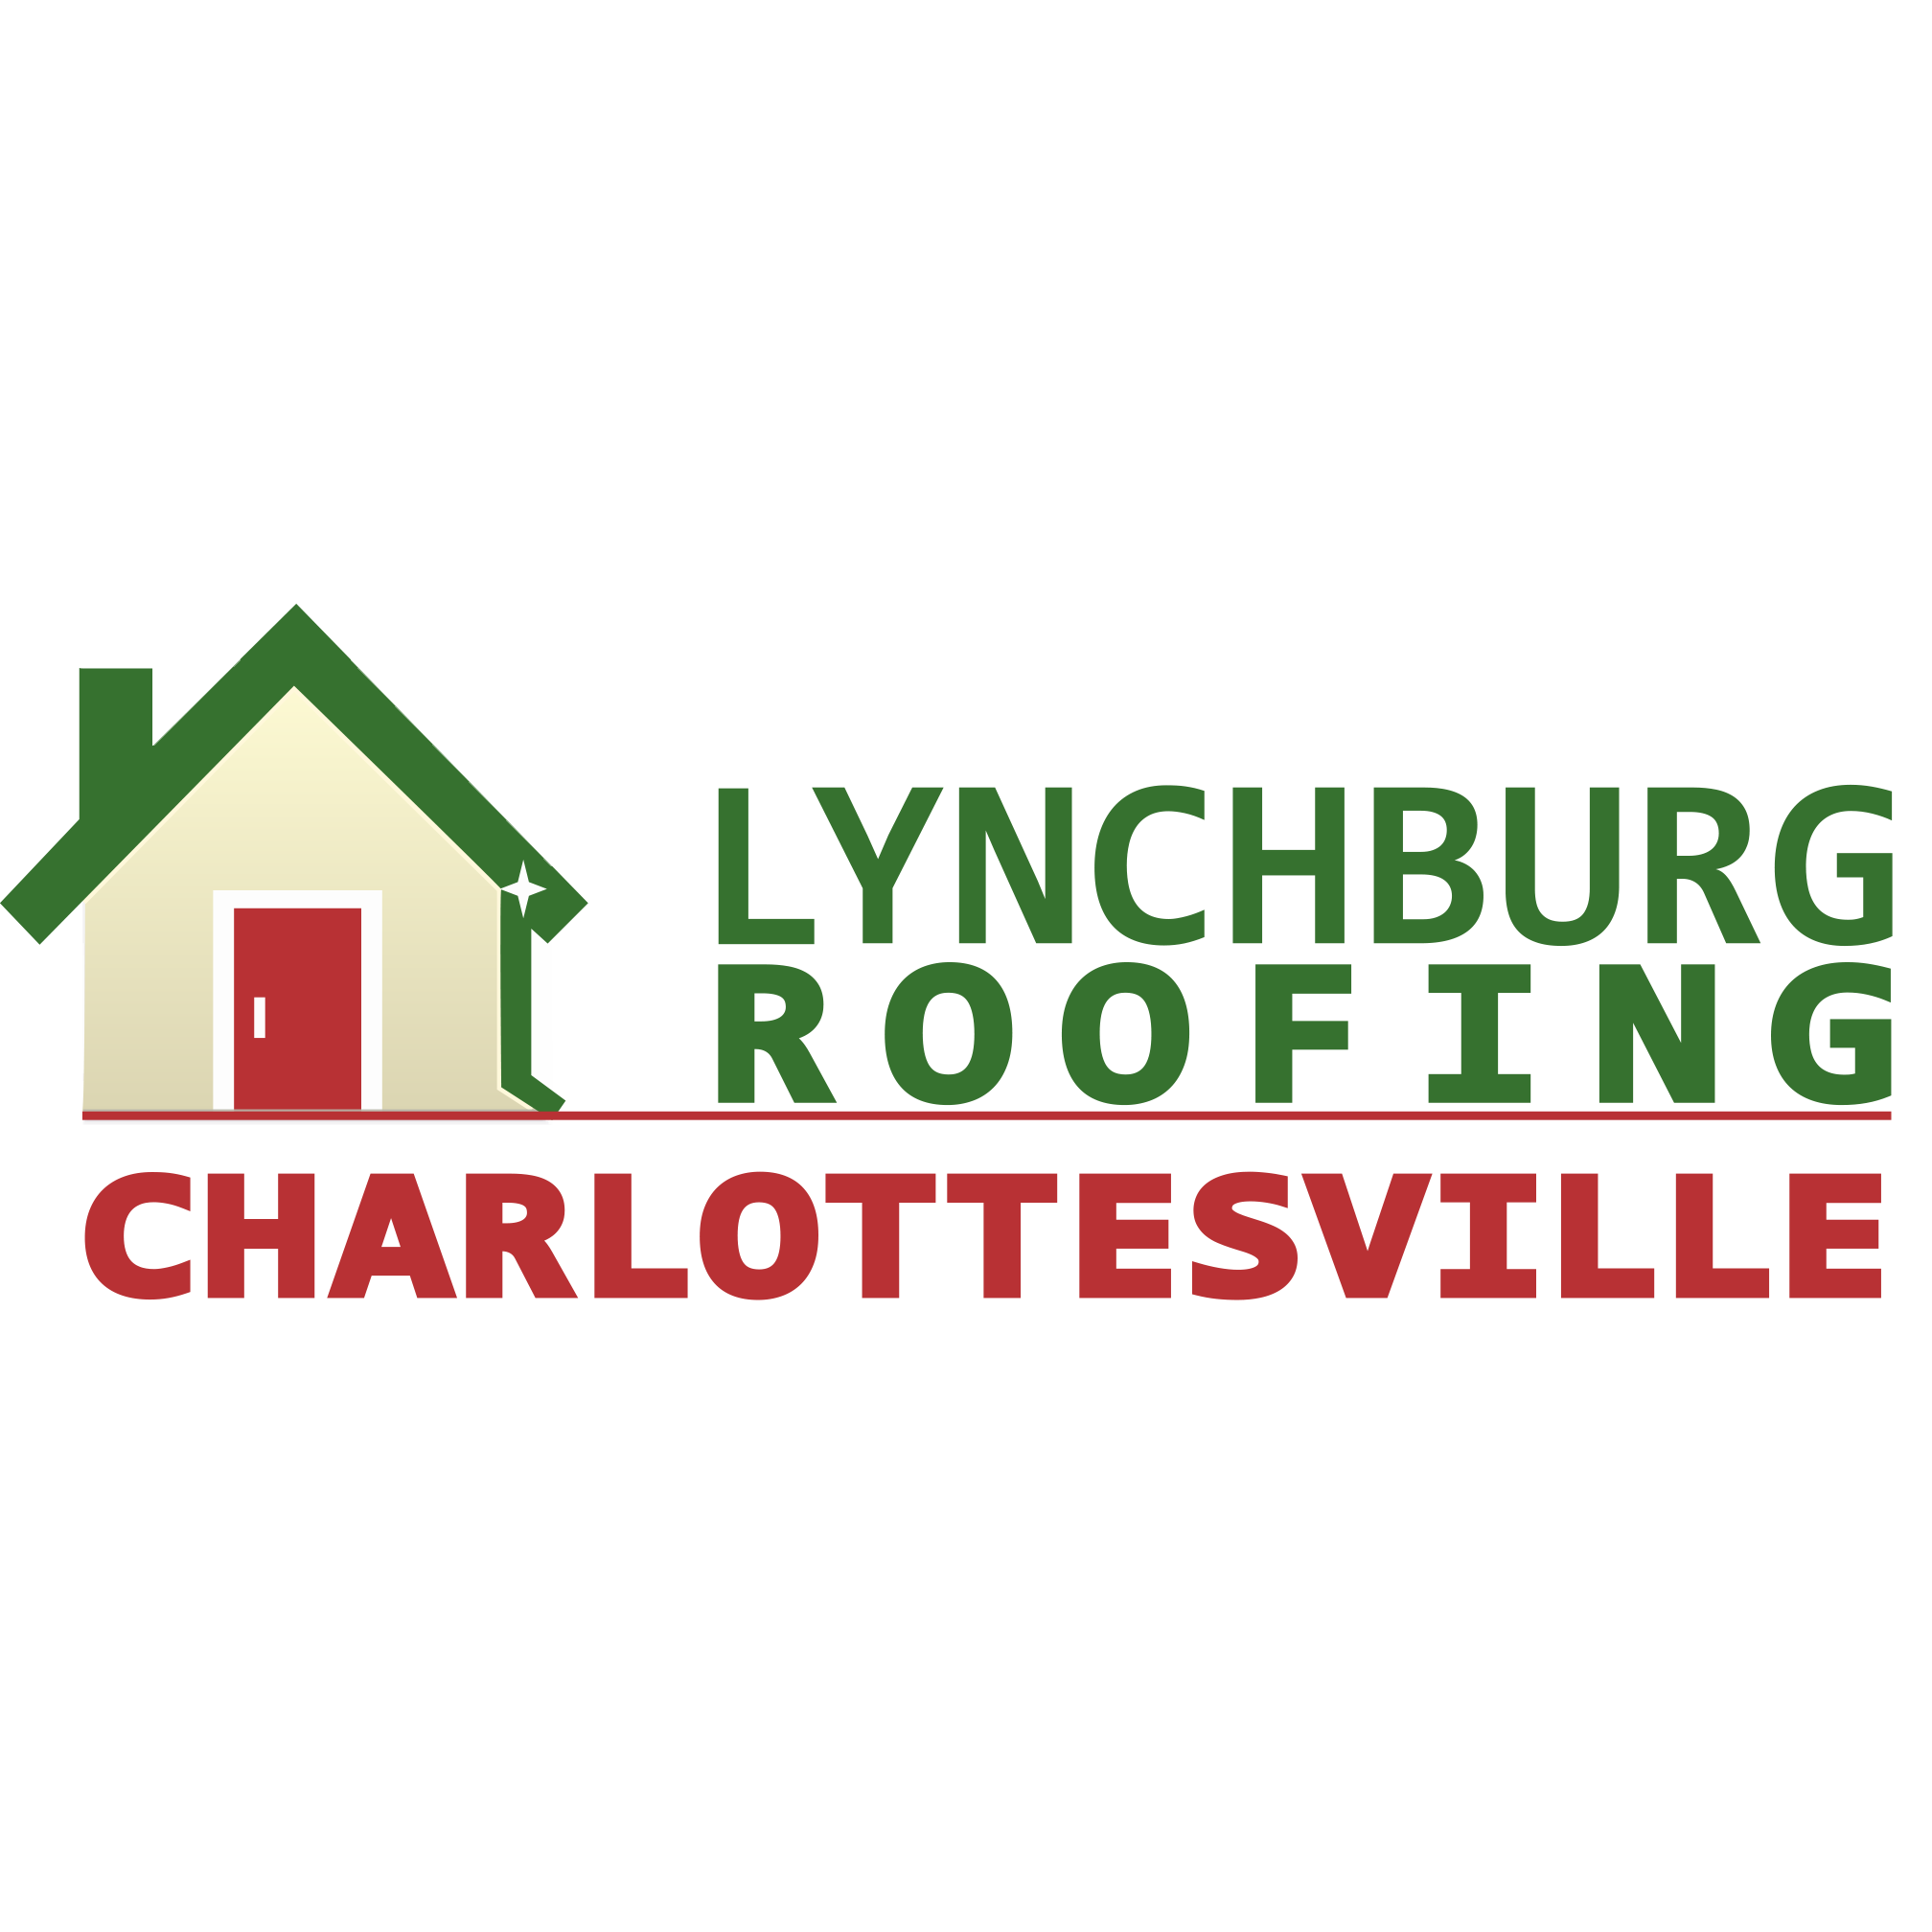 Lynchburg Roofing, Charlottesville image 0